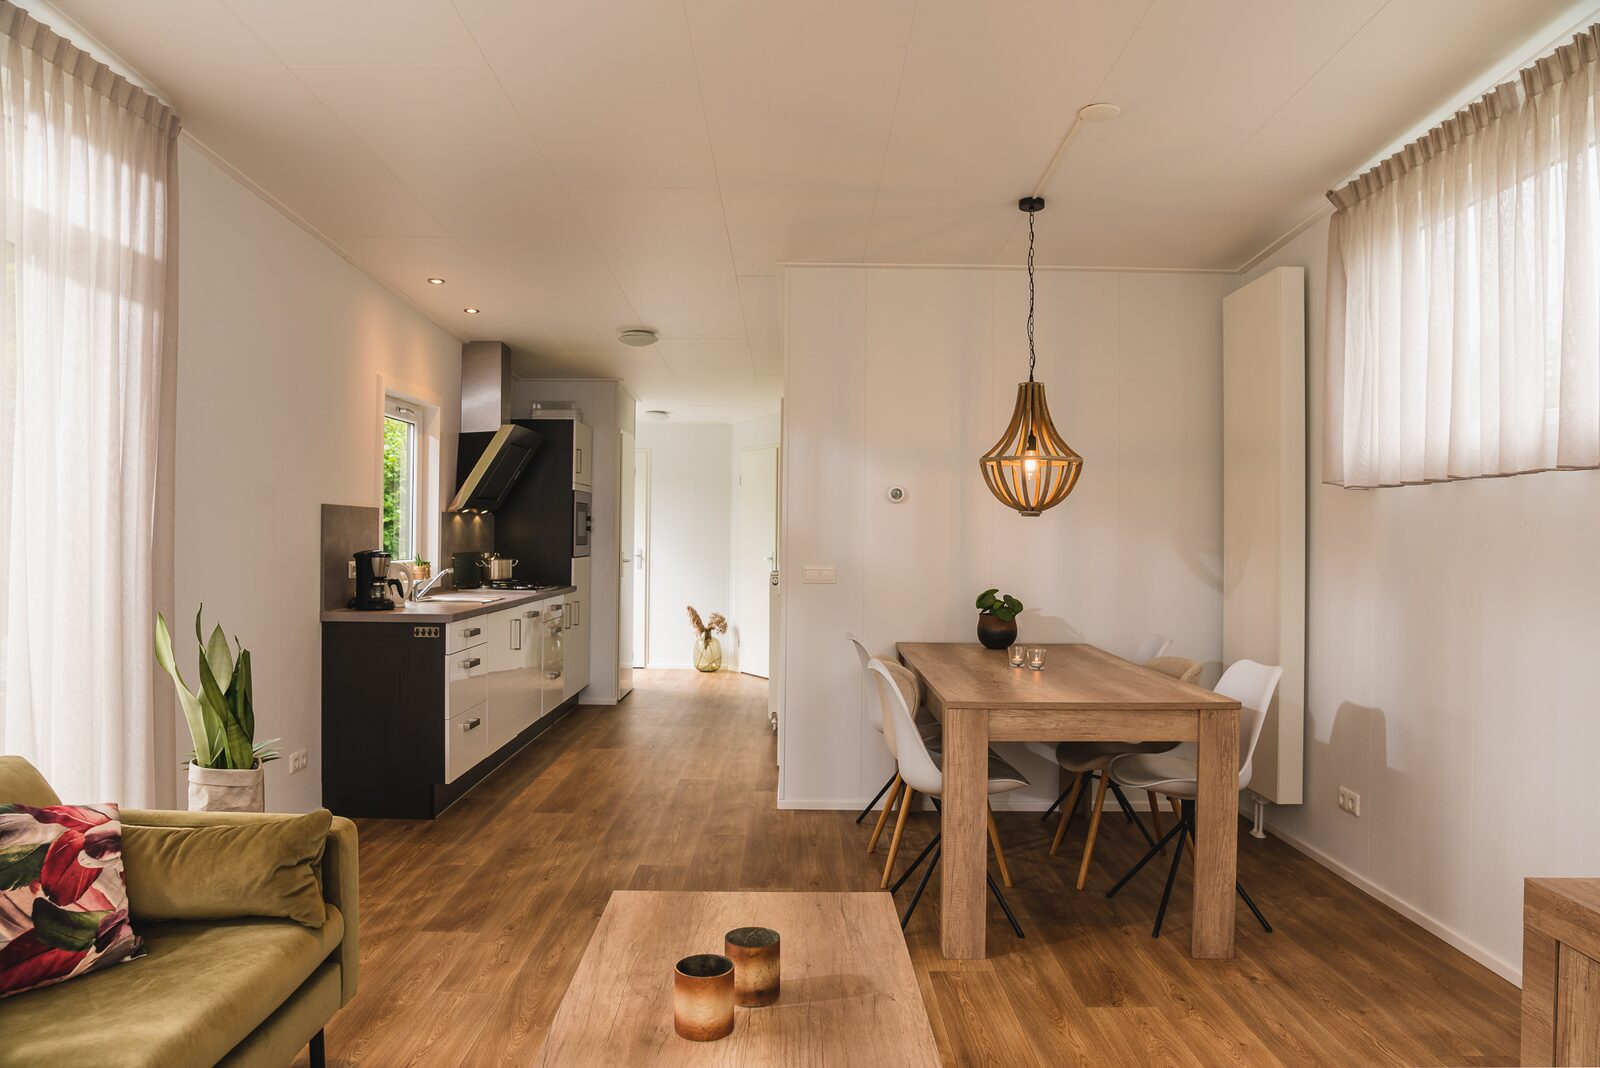 Luxury lodge | 6 pers.